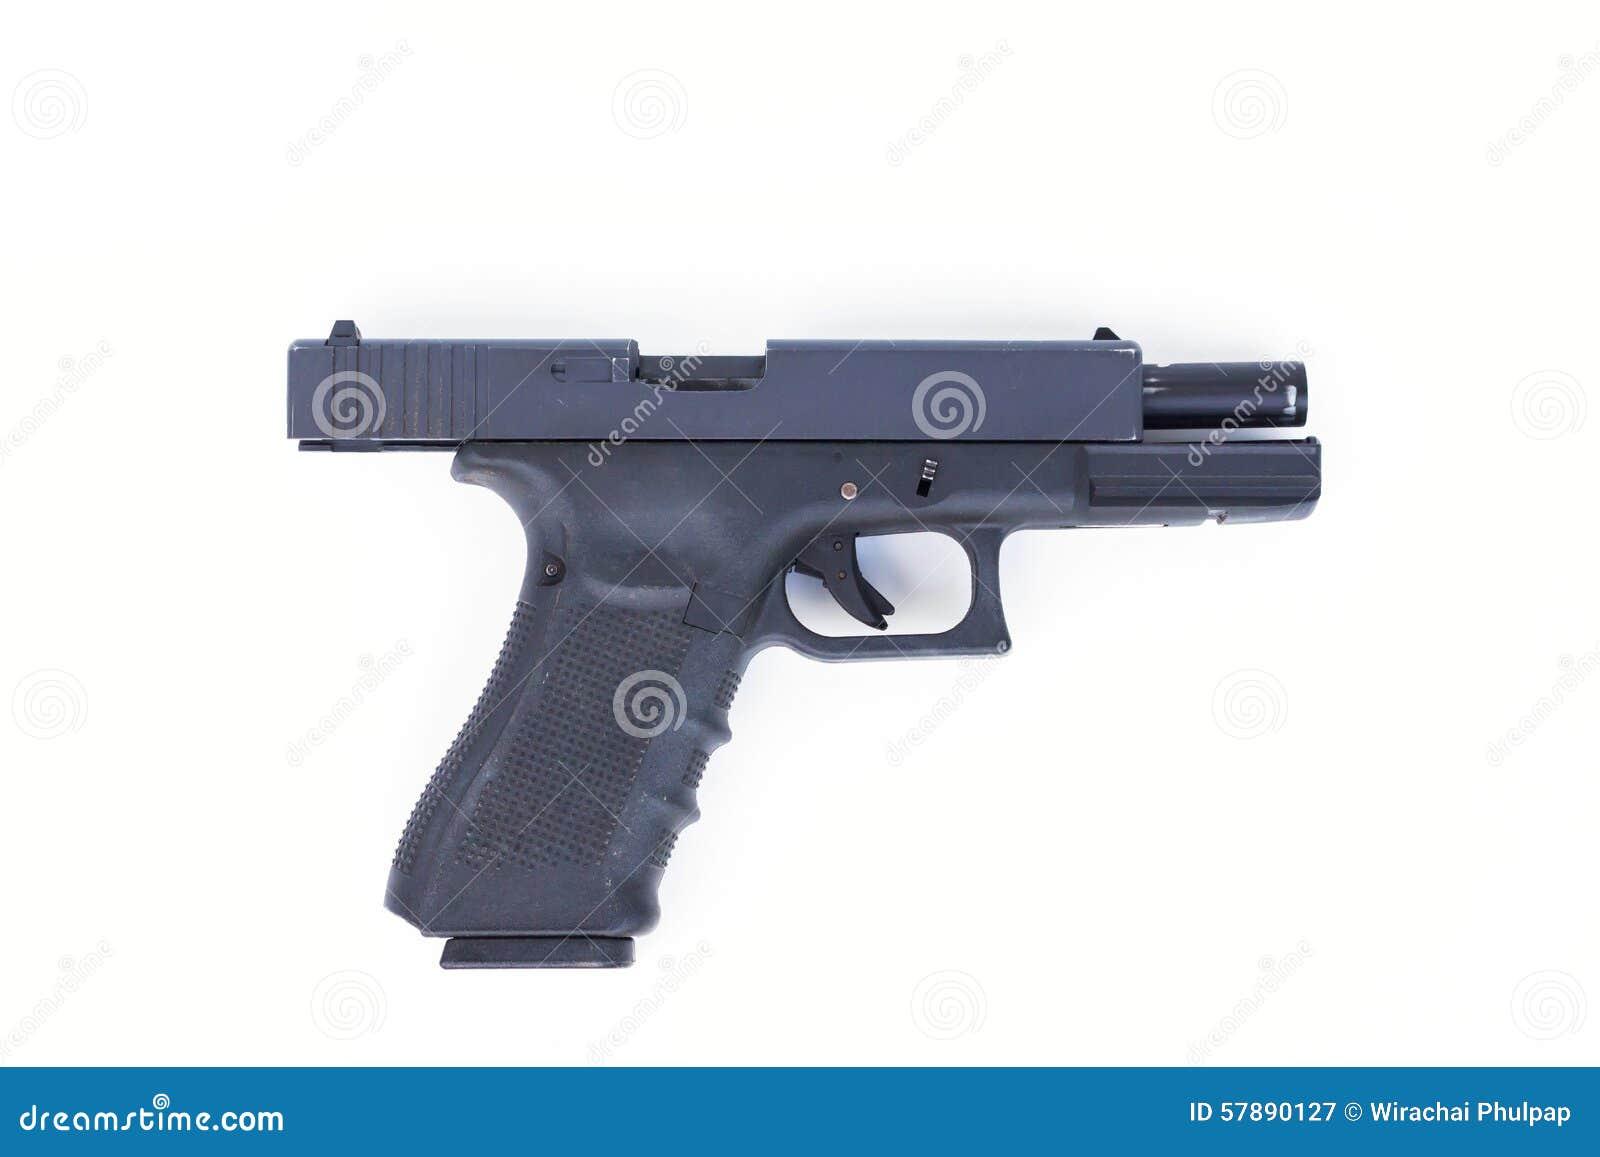 gun white background - photo #19